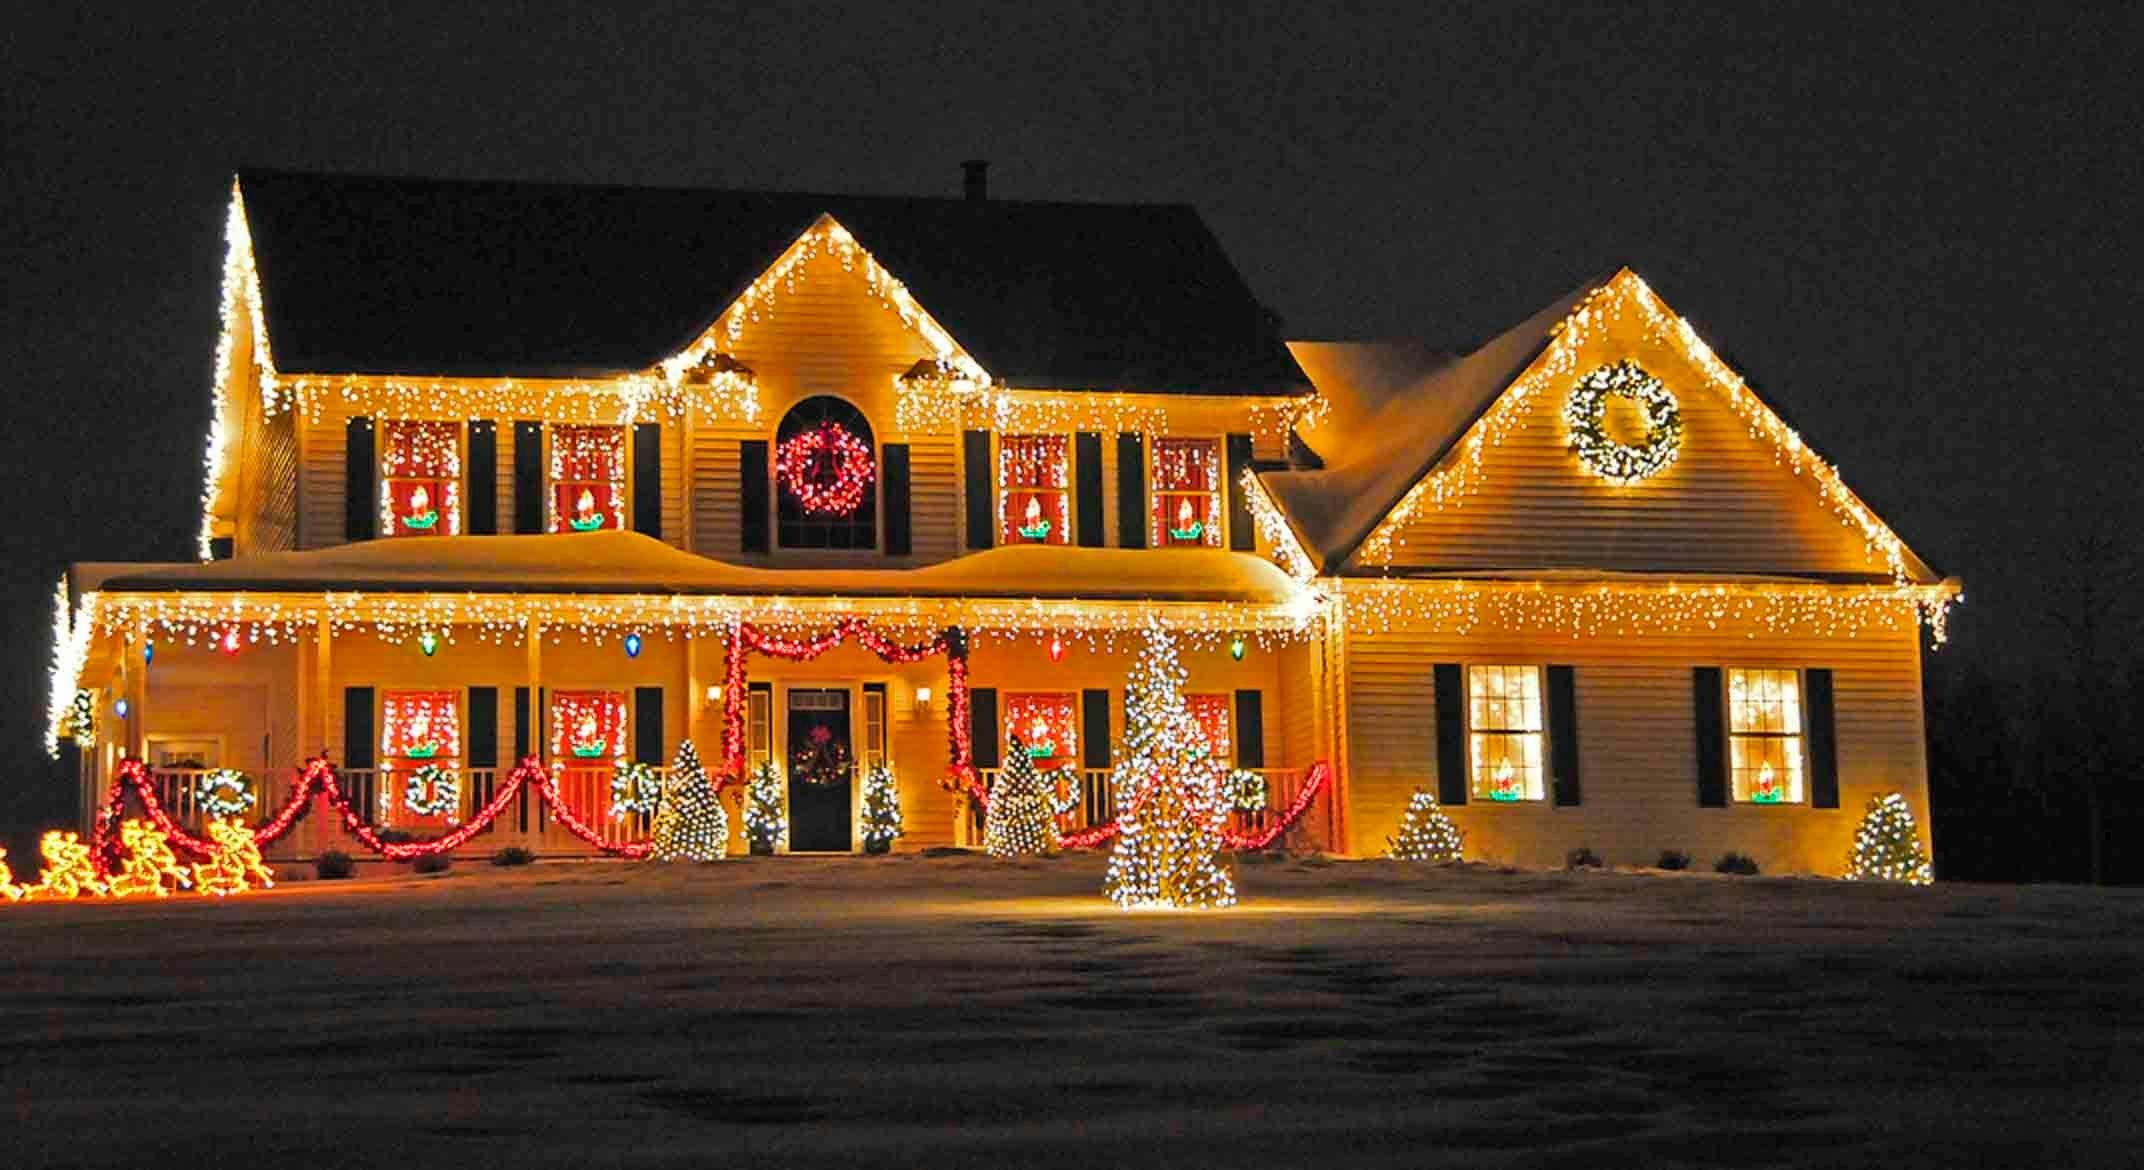 decorations xmas tree decorations ideas neighbor still has her christmas decorations on house lights outdoor christmas house decorating ideas magnificent christmas house decorations